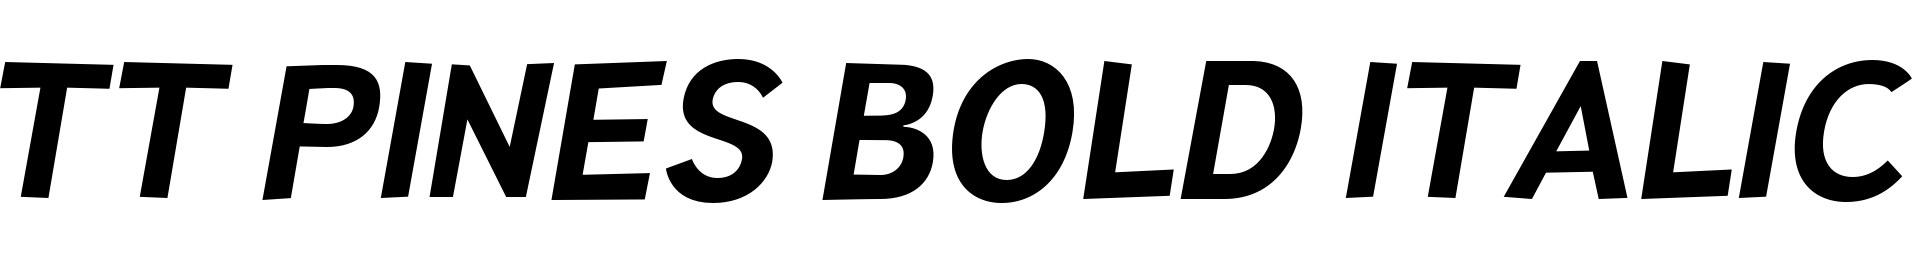 TT Pines Bold Italic